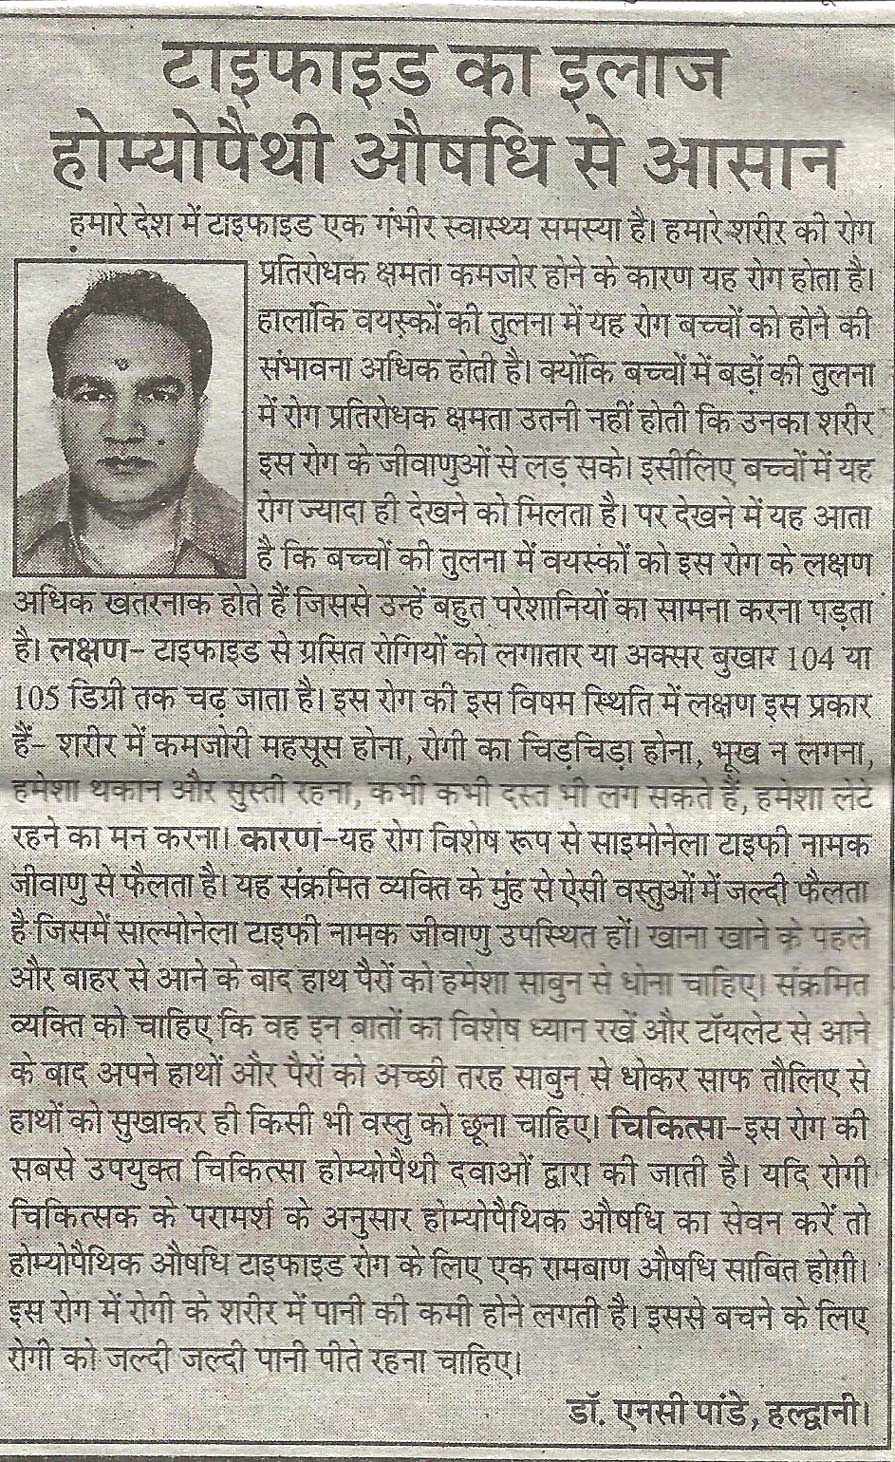 Uttaranchal Darpan, 12 Feb 2015, Page 6